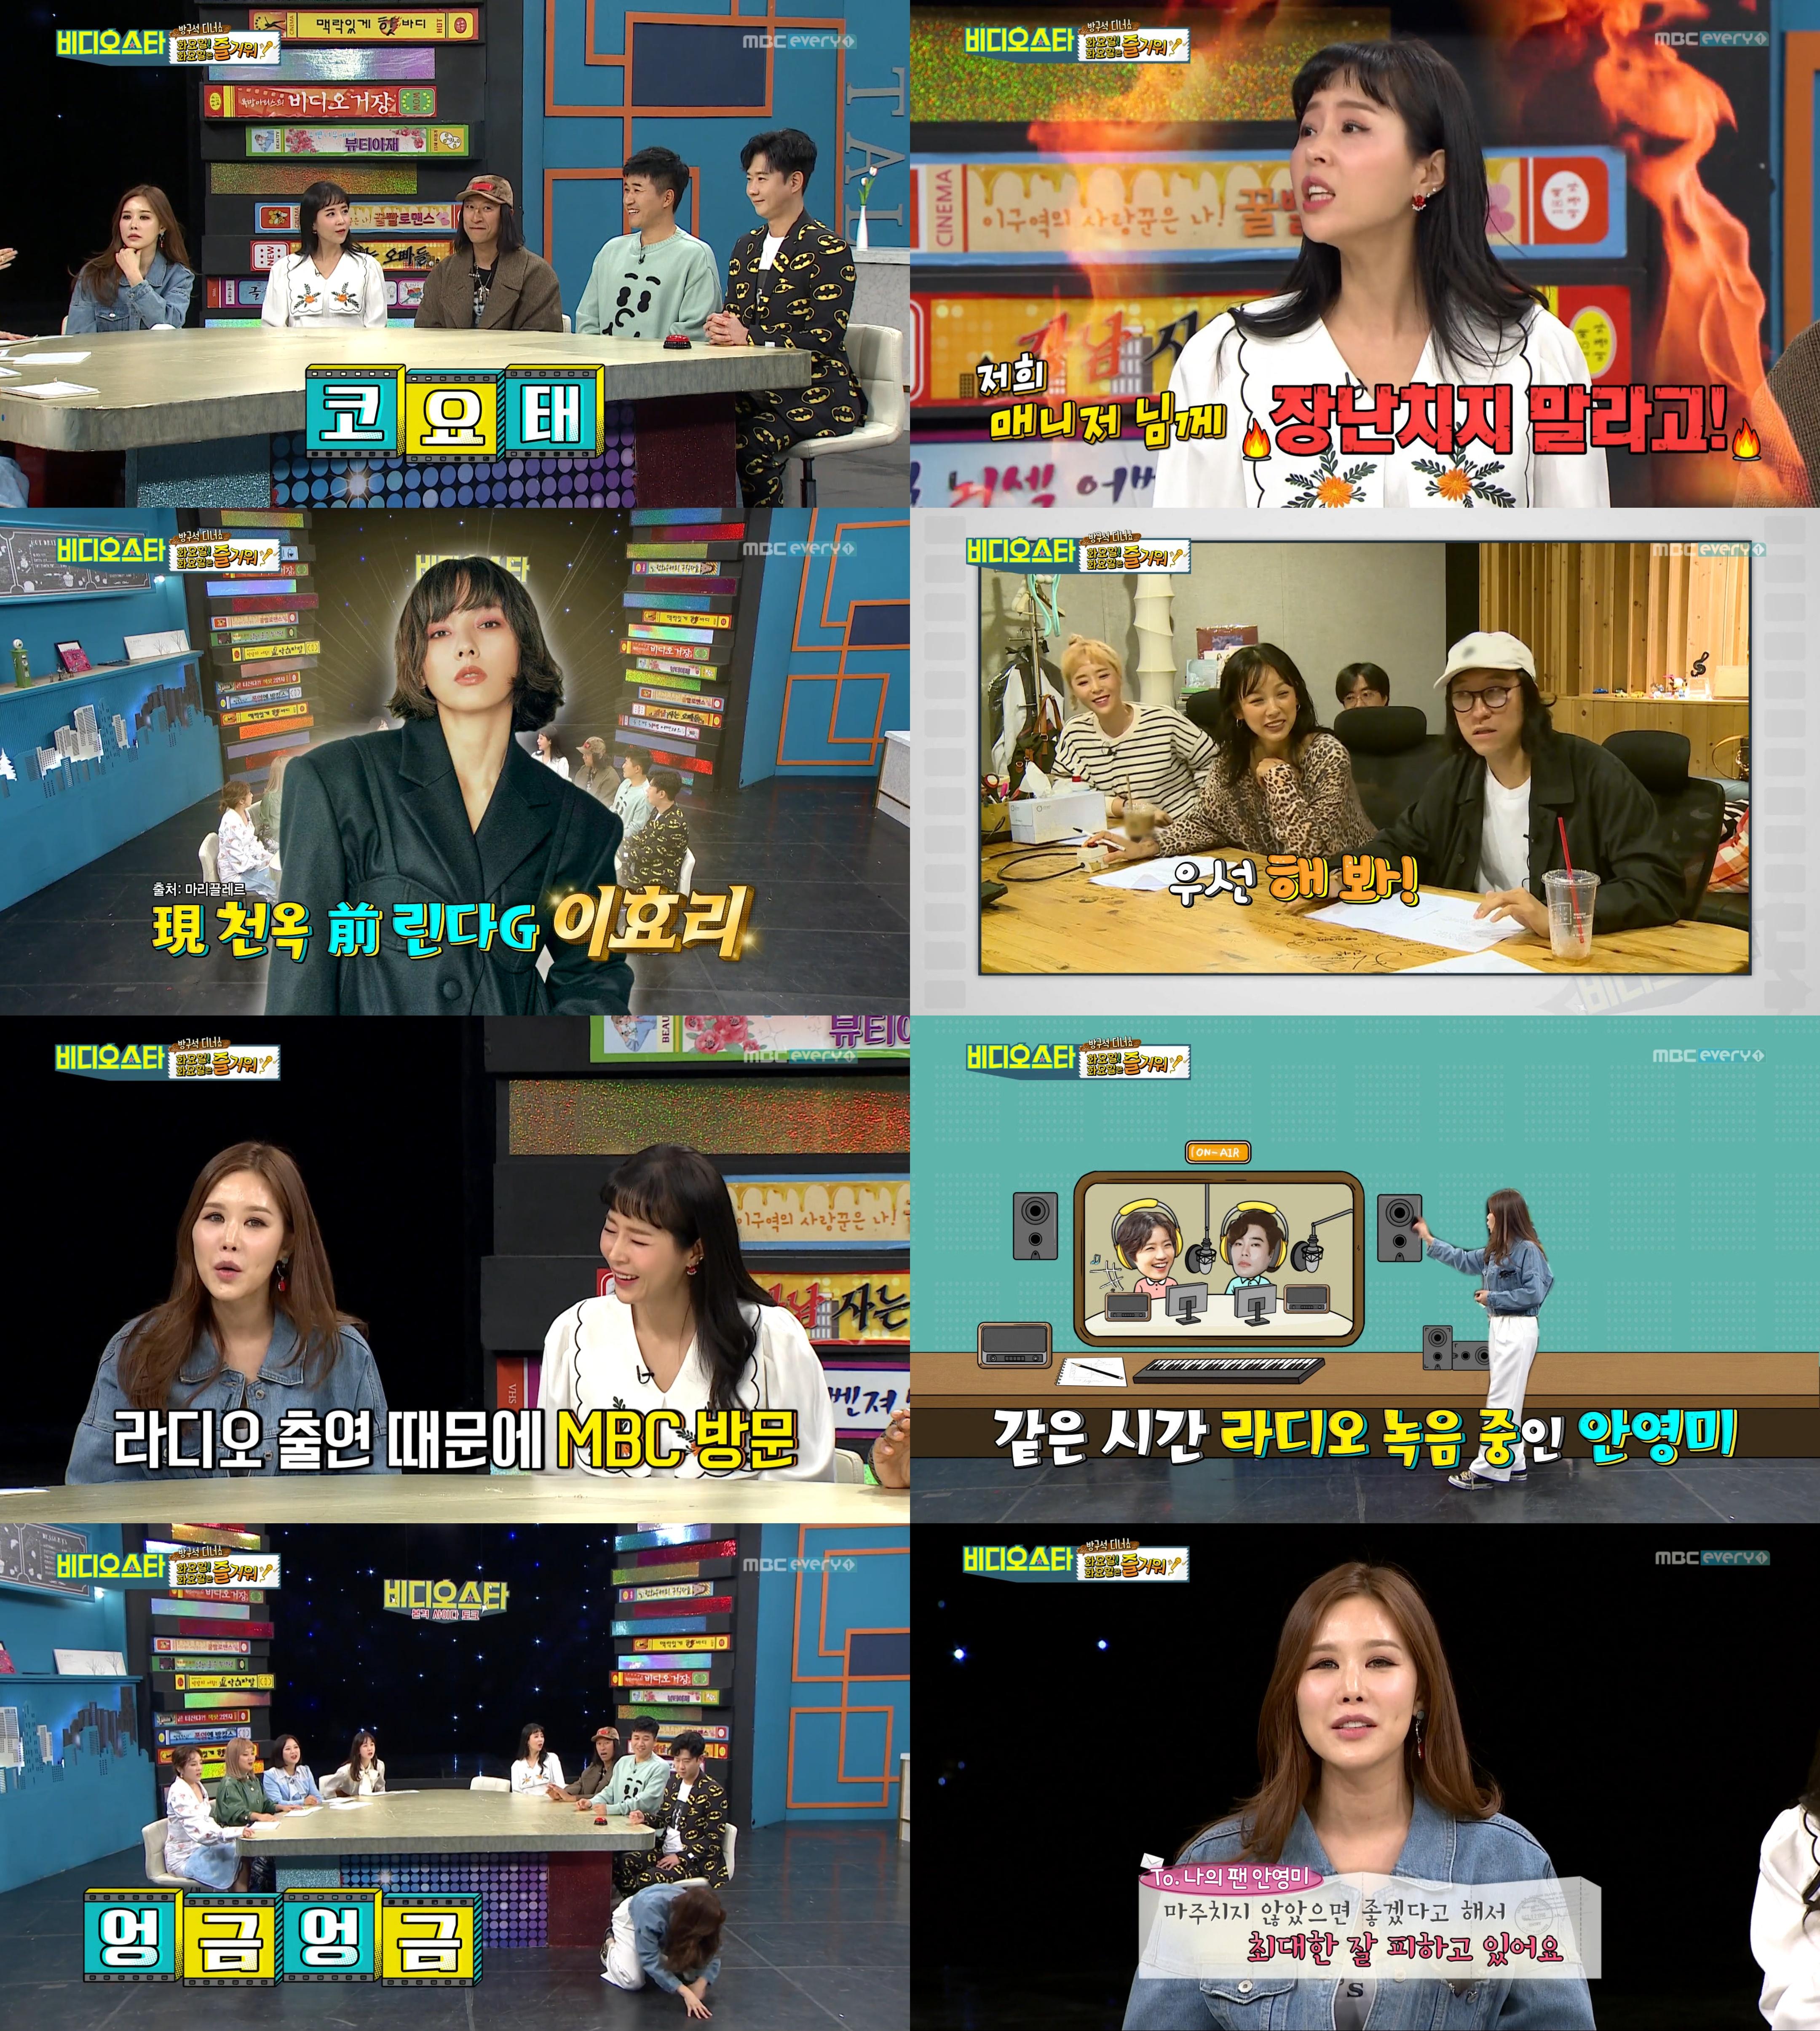 [re뷰] '비디오스타' 채리나X신지X빽가X김종민X천명훈, 방구석 디너쇼! (Feat. 이효리)